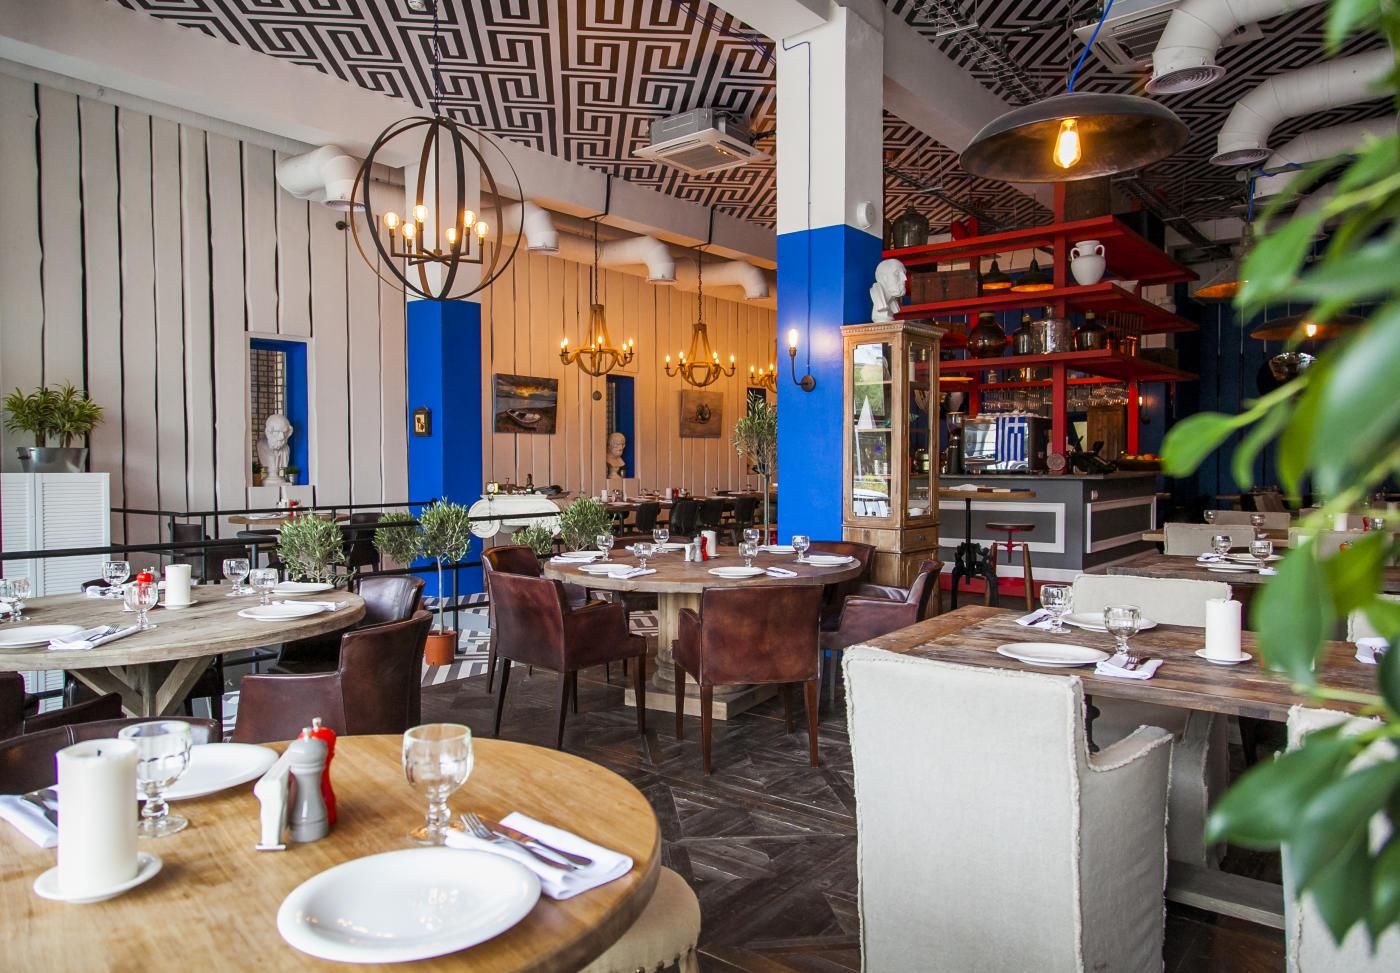 Греческий Ресторан Molon Lave (Молон Лаве) фото 1